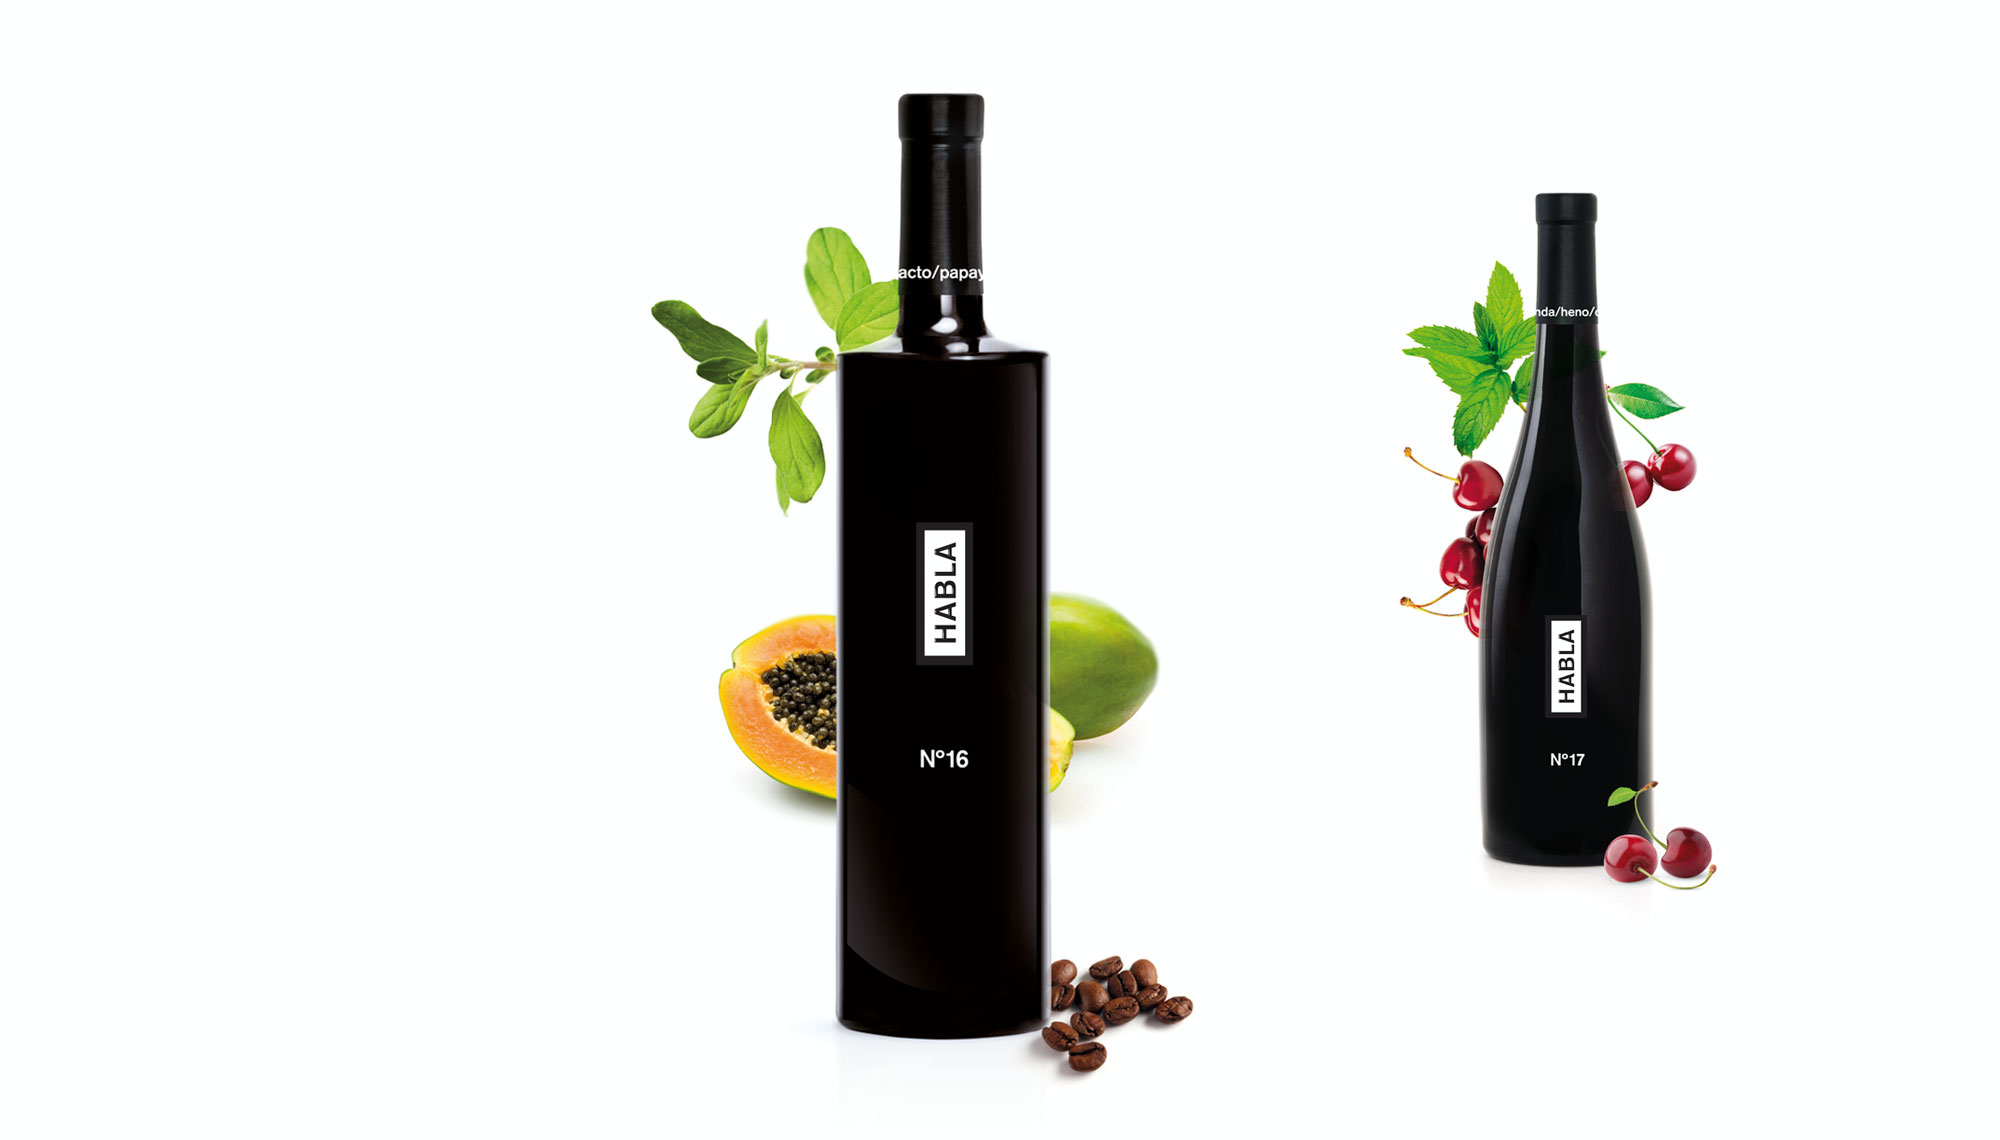 Bodegas Habla diseño de los vinos Habla - Valentín Iglesias